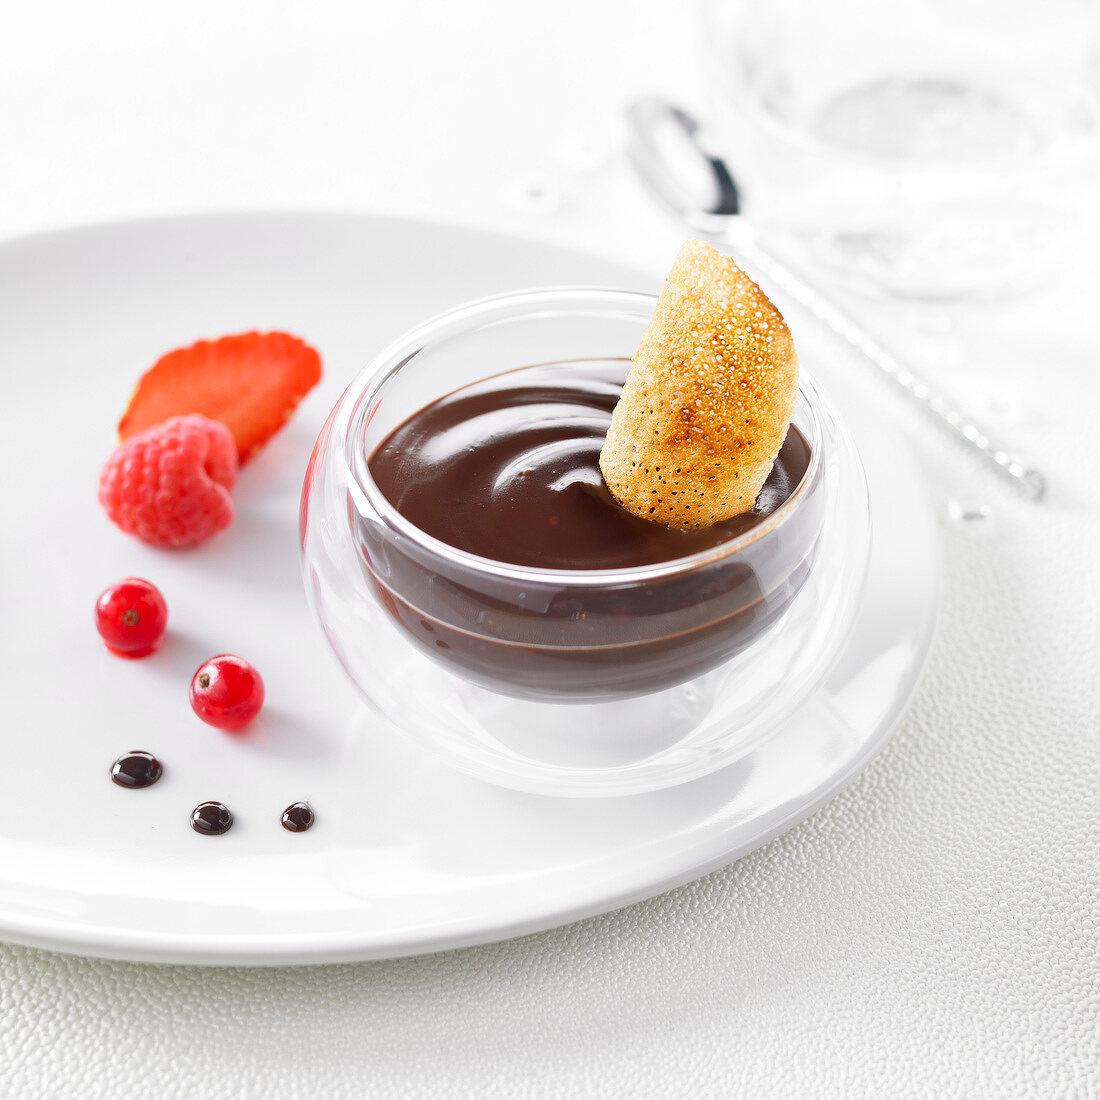 Chocolate cream dessert with a crisp caramellized tuile